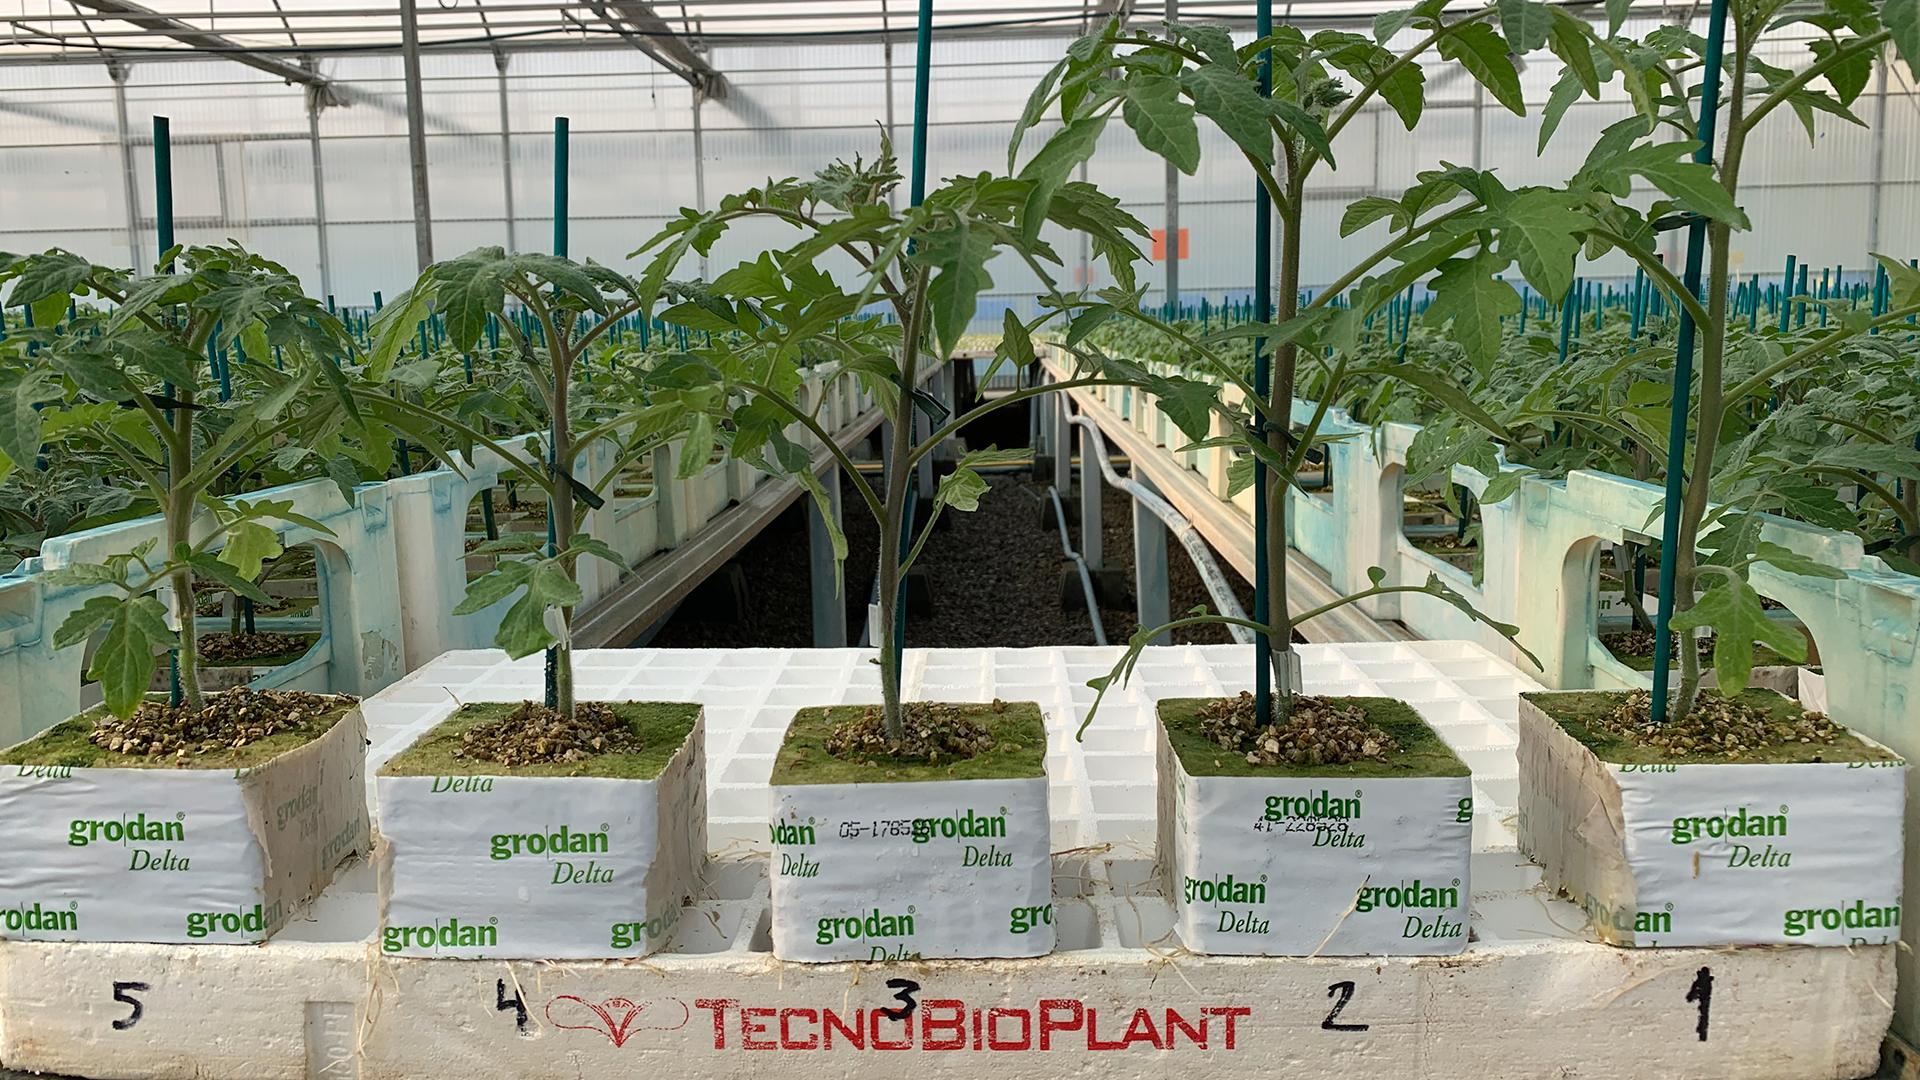 tecnobioplant-planta-horticola-03